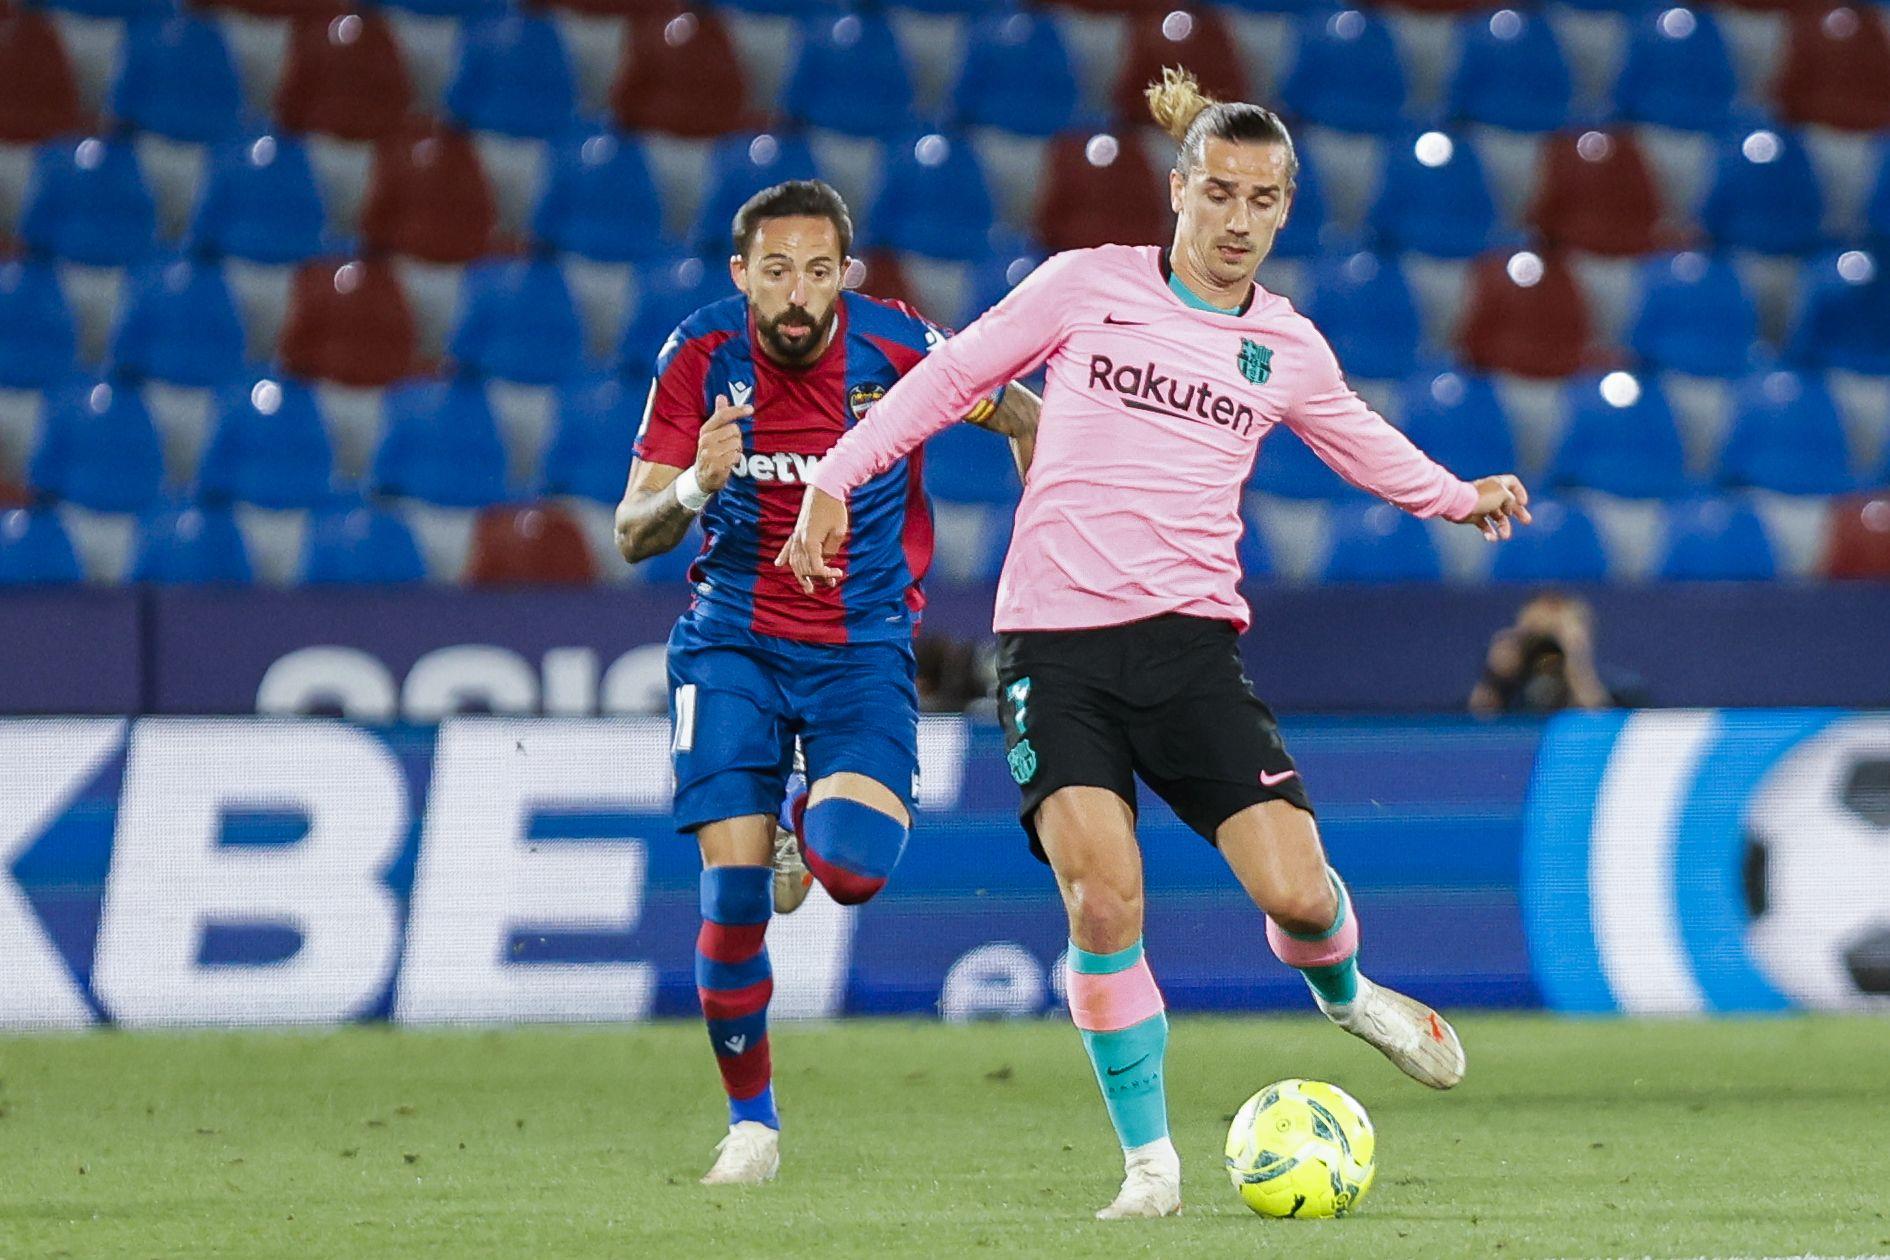 Levante UD 3 - FC Barcelona 3